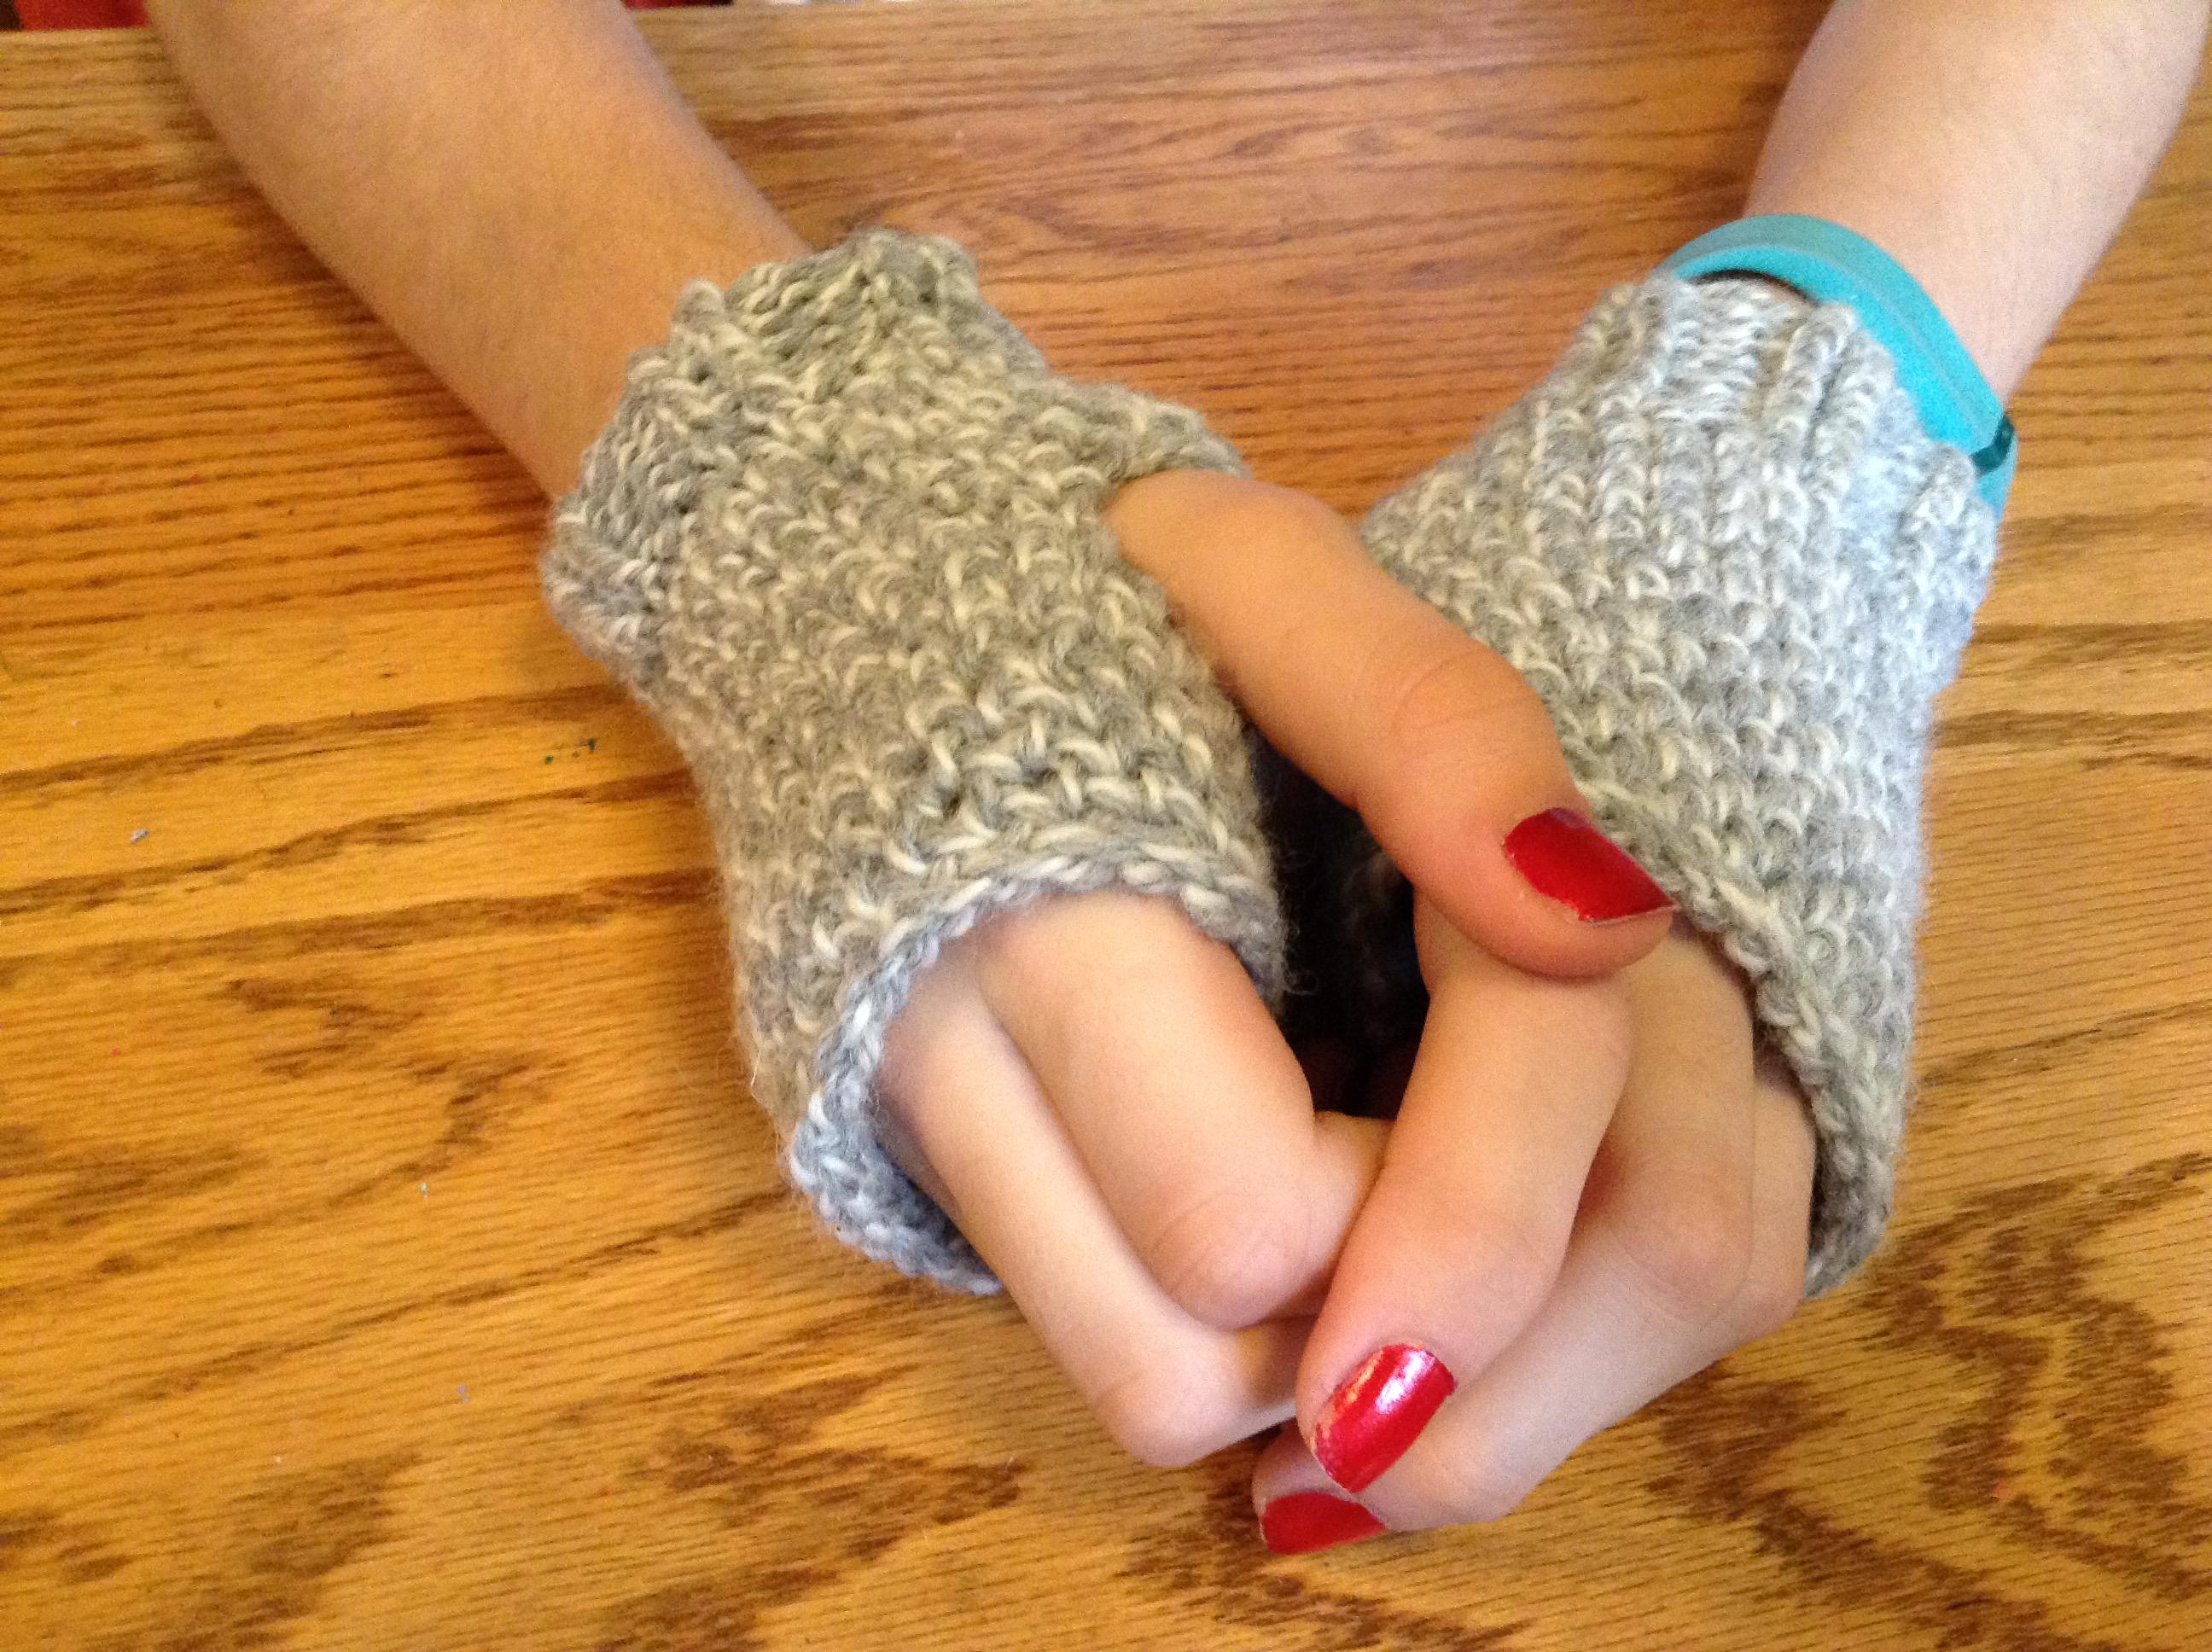 DEBlog: Loom knit fingerless mittens in figure 8 stitch (pattern)